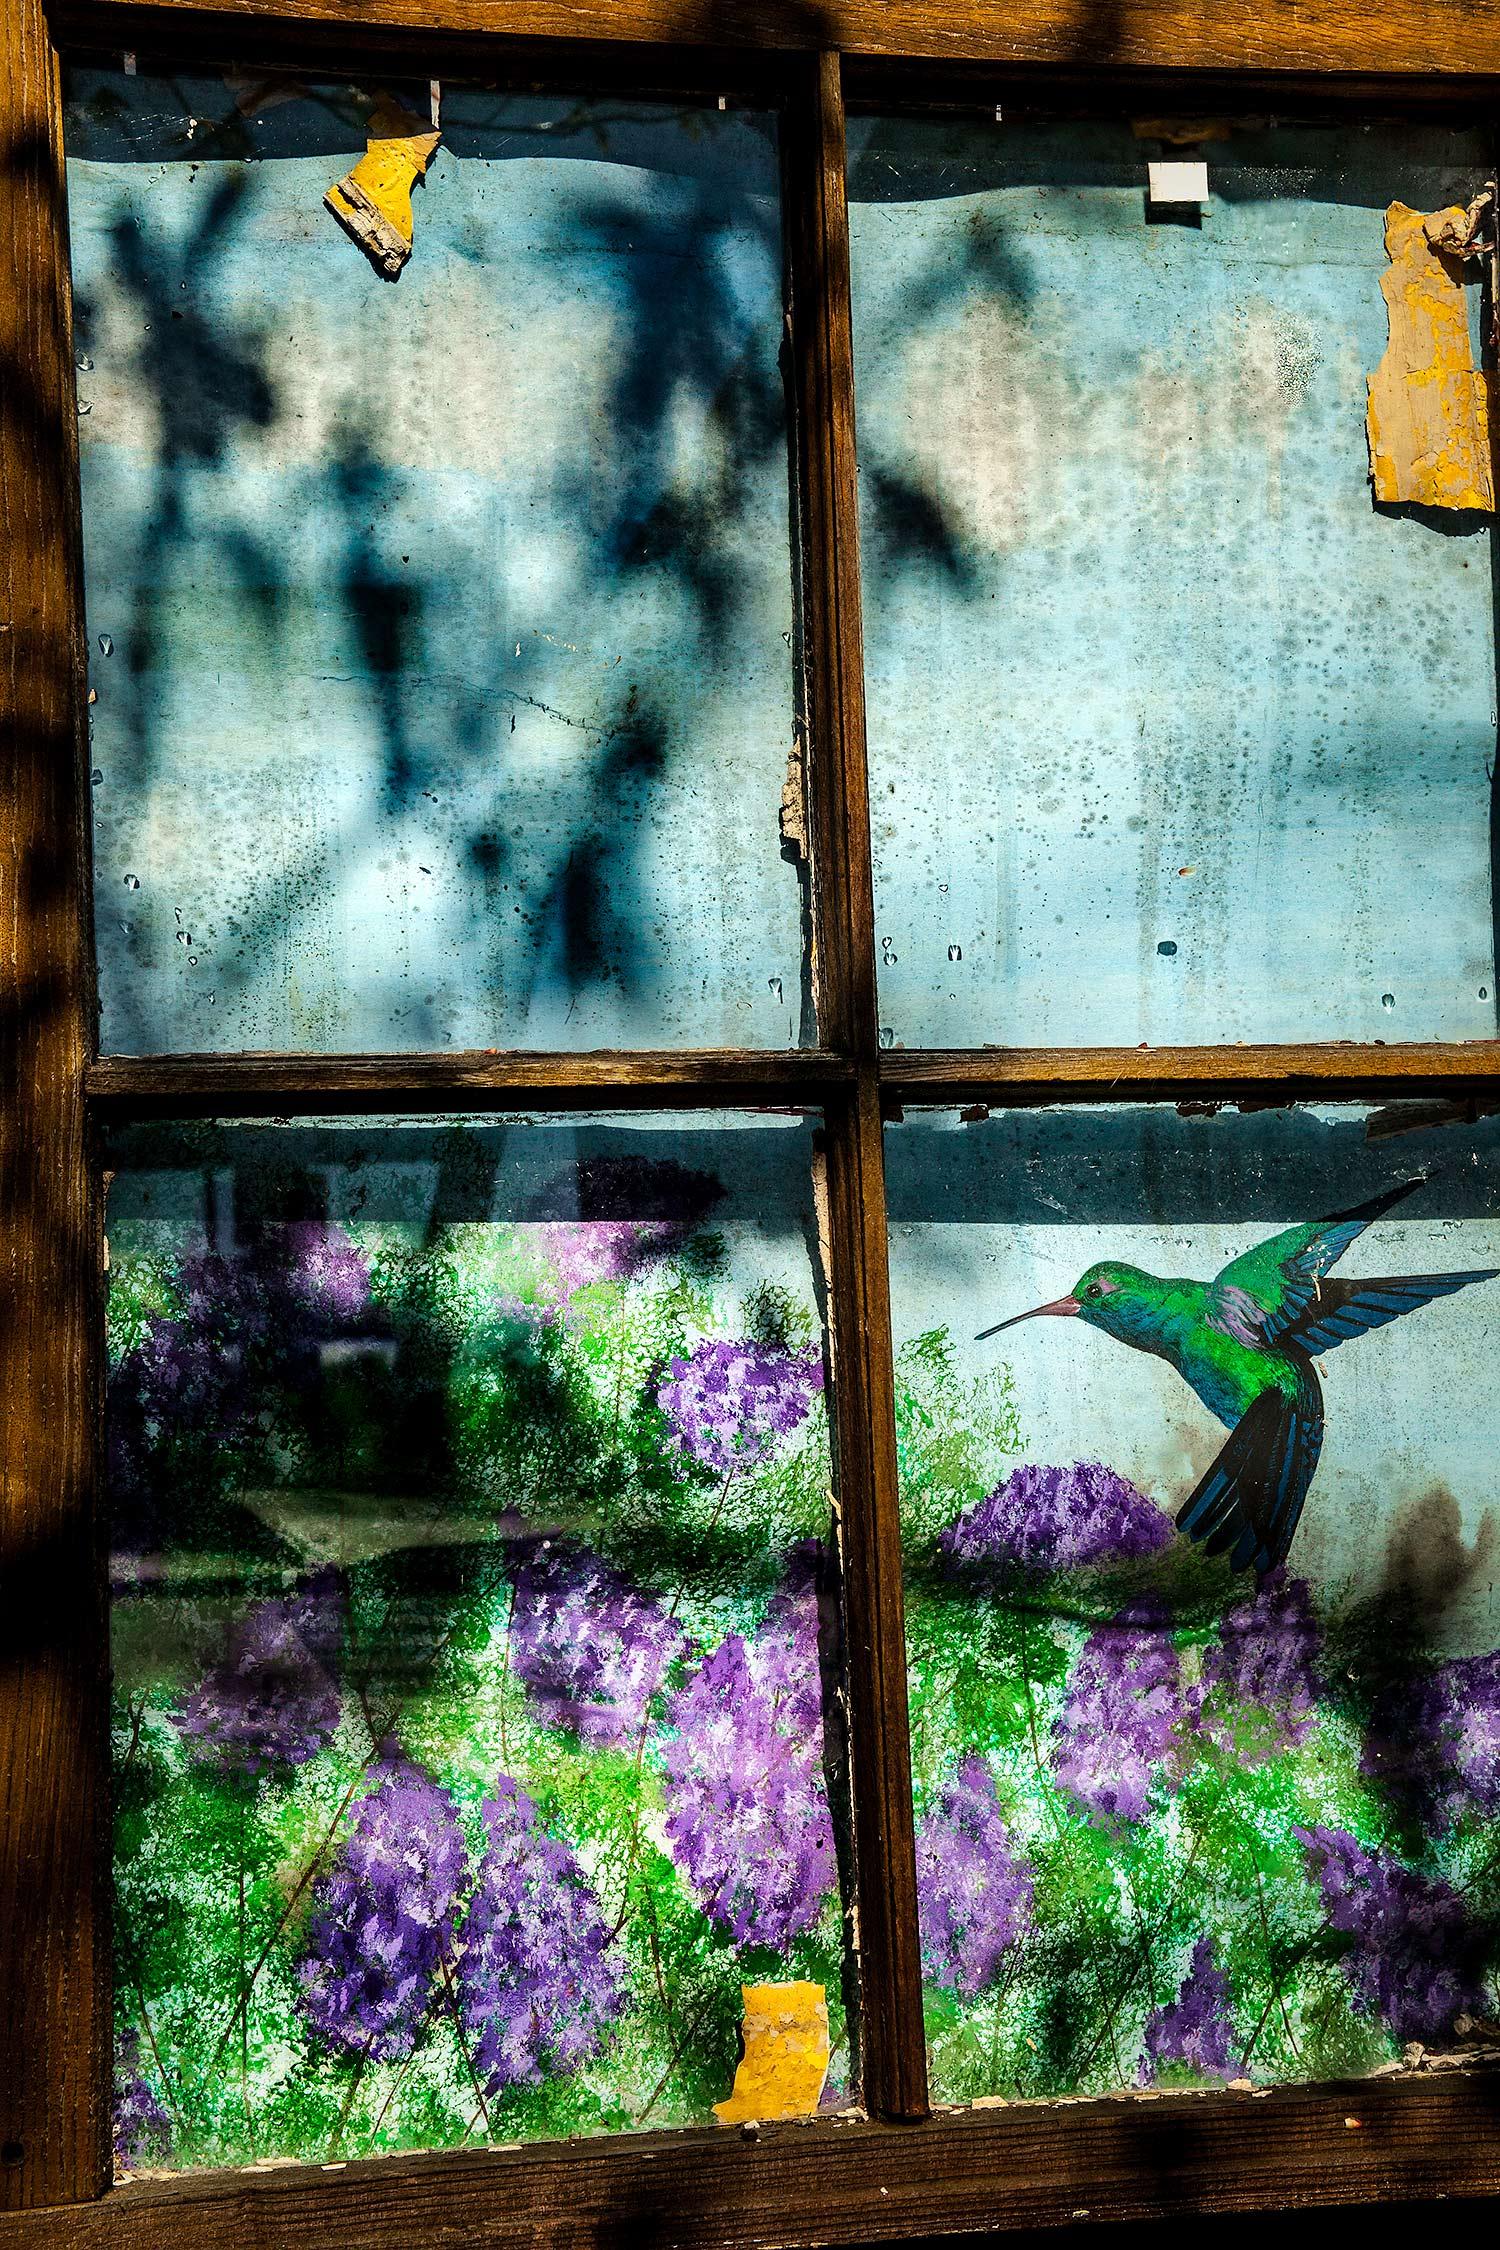 Window, Searsport, Maine, 2010